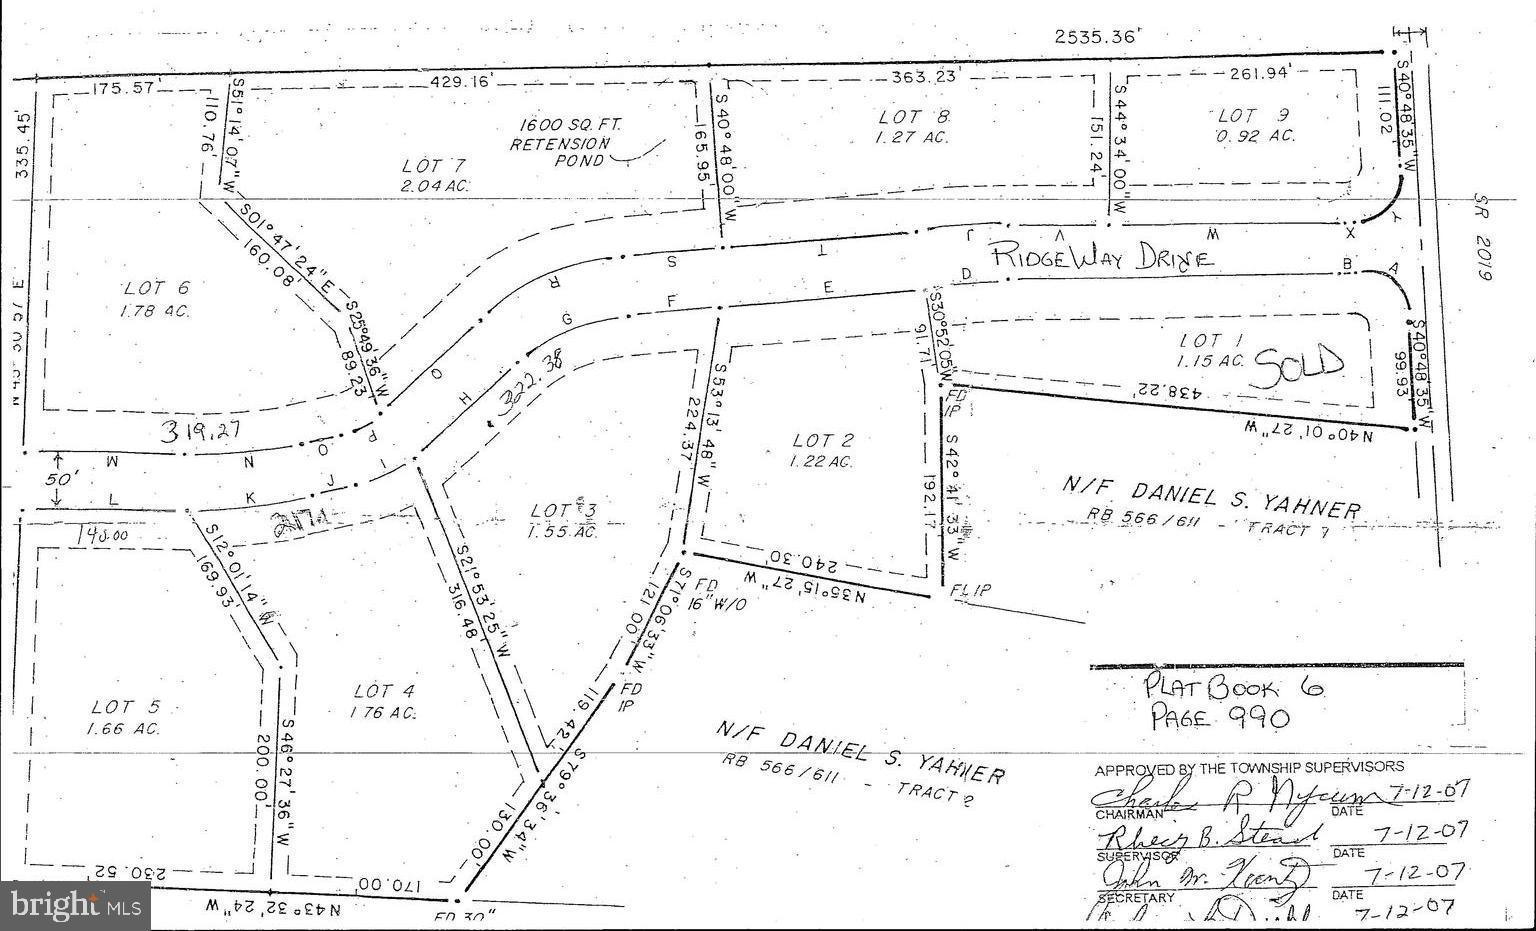 Lot #3 RIDGE WAY DRIVE, EVERETT, PA 15537